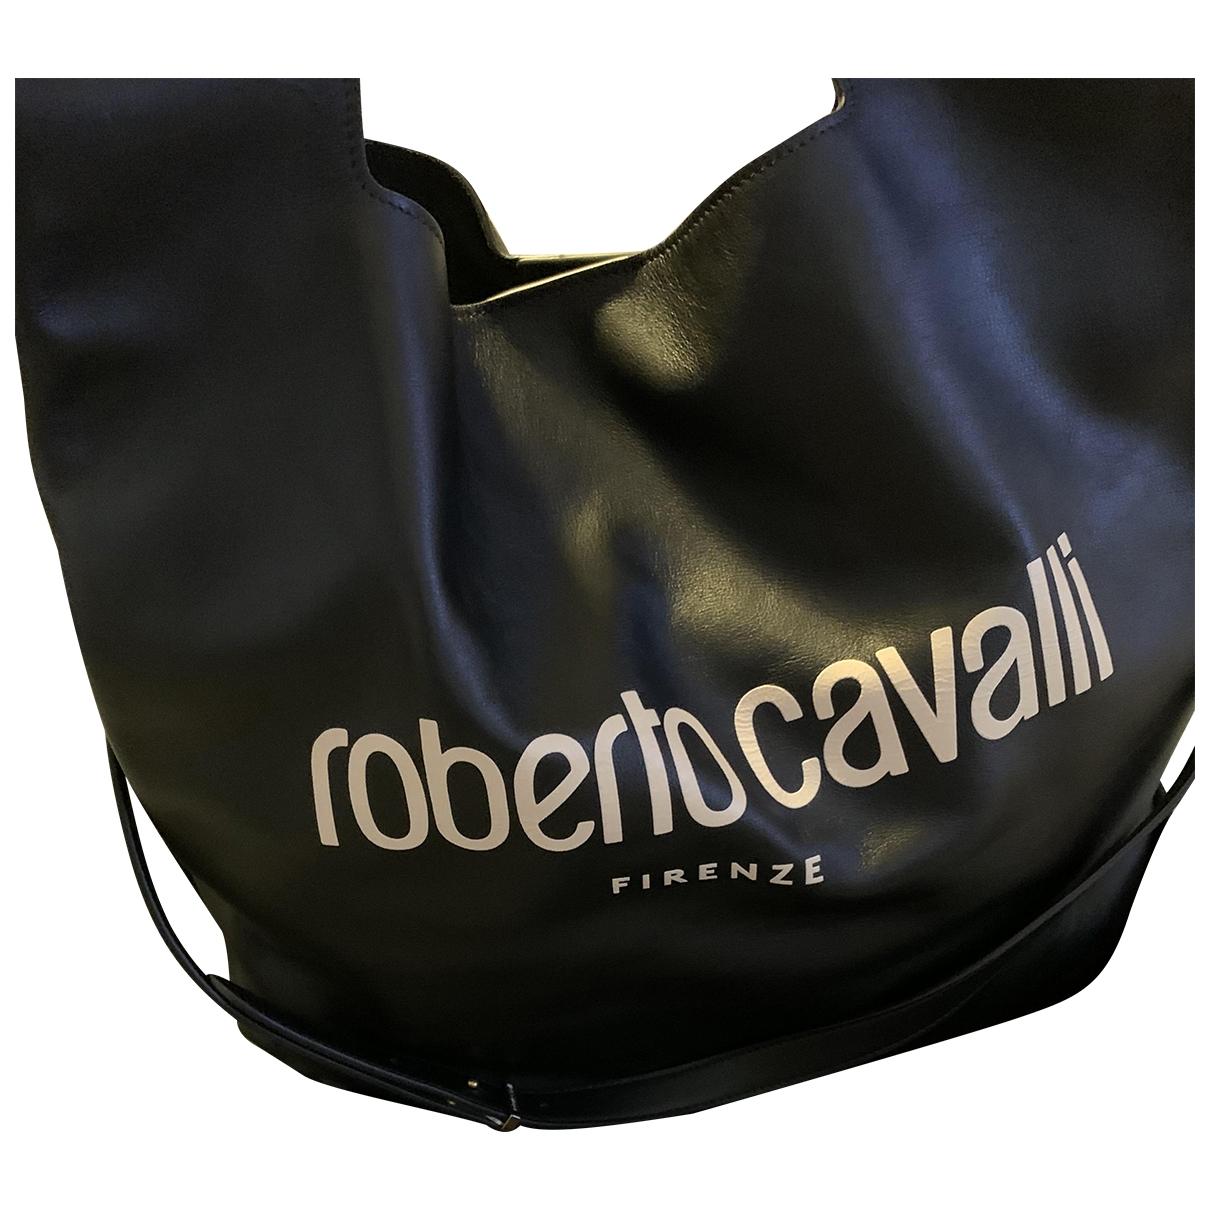 Roberto Cavalli - Sac a main   pour femme en cuir - noir